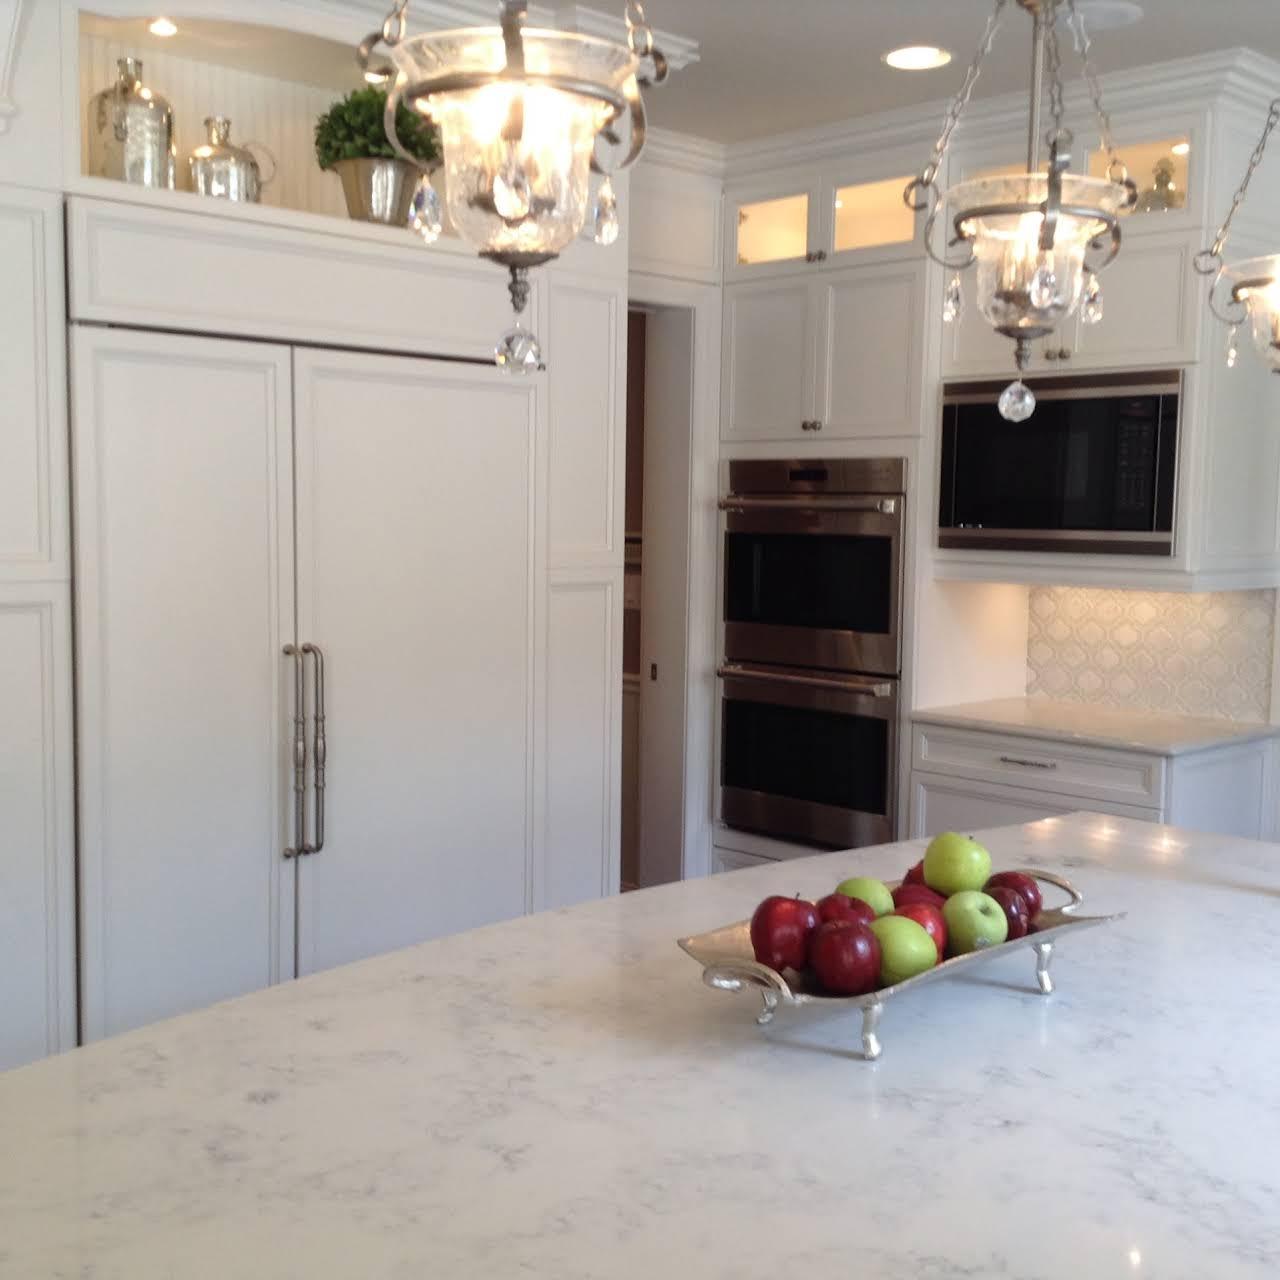 Designer Kitchen & Bath - Cabinet Store in Freehold